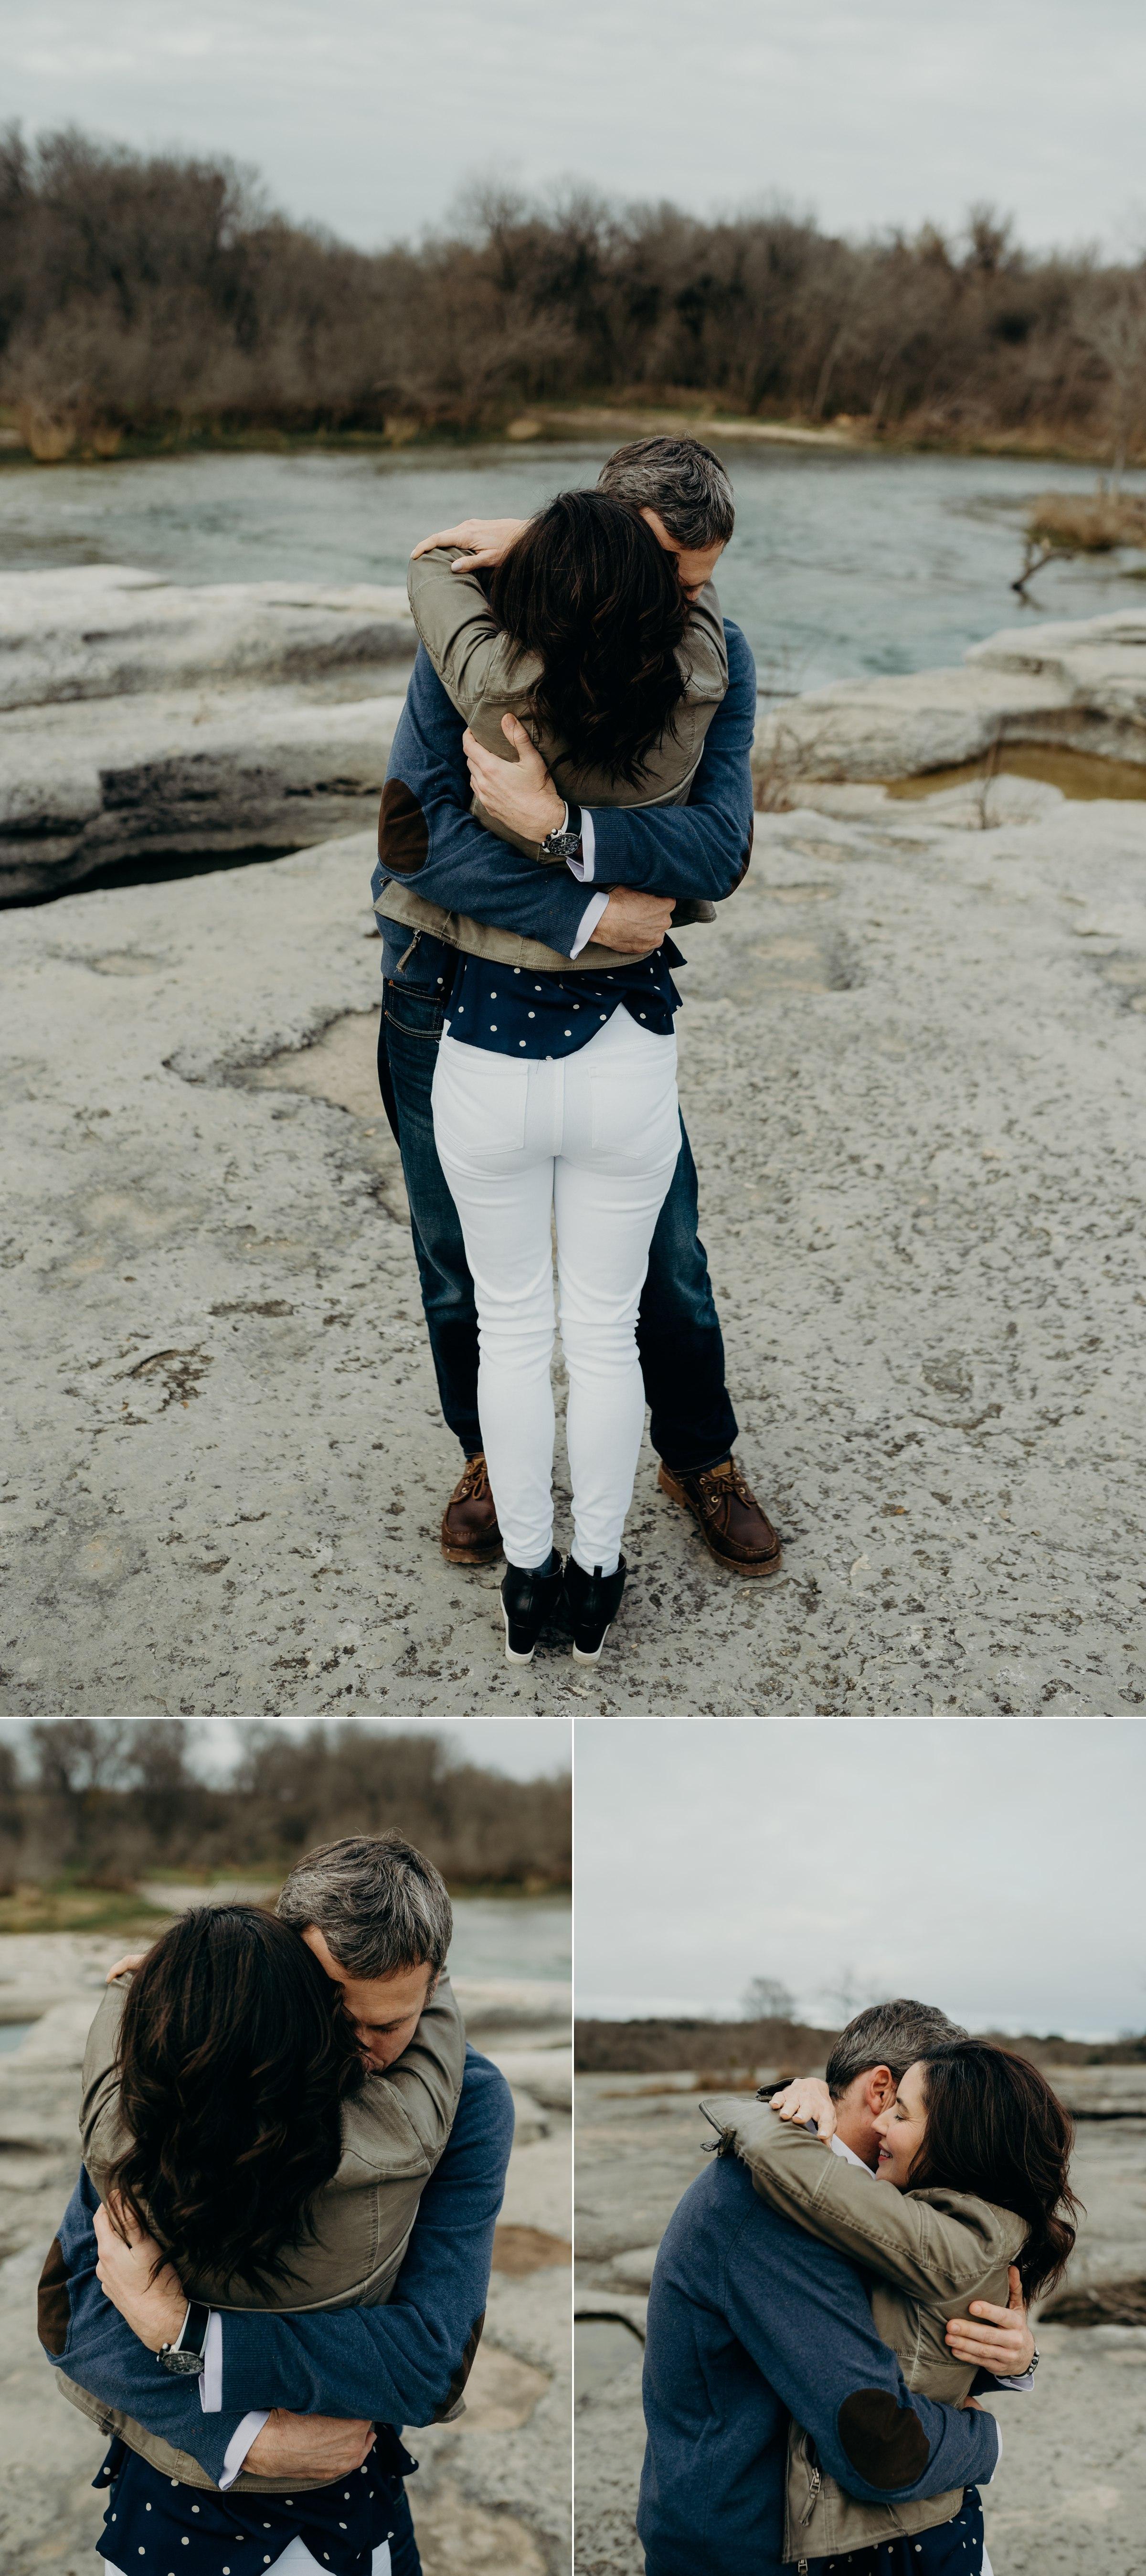 austin-mckinney-falls-engagement-photographer-elopement-prices-best-headshot-senior-adventurous-italy-minneapolis-texas-minnesota-dallas-houston-tulum-mexico_0036.jpg